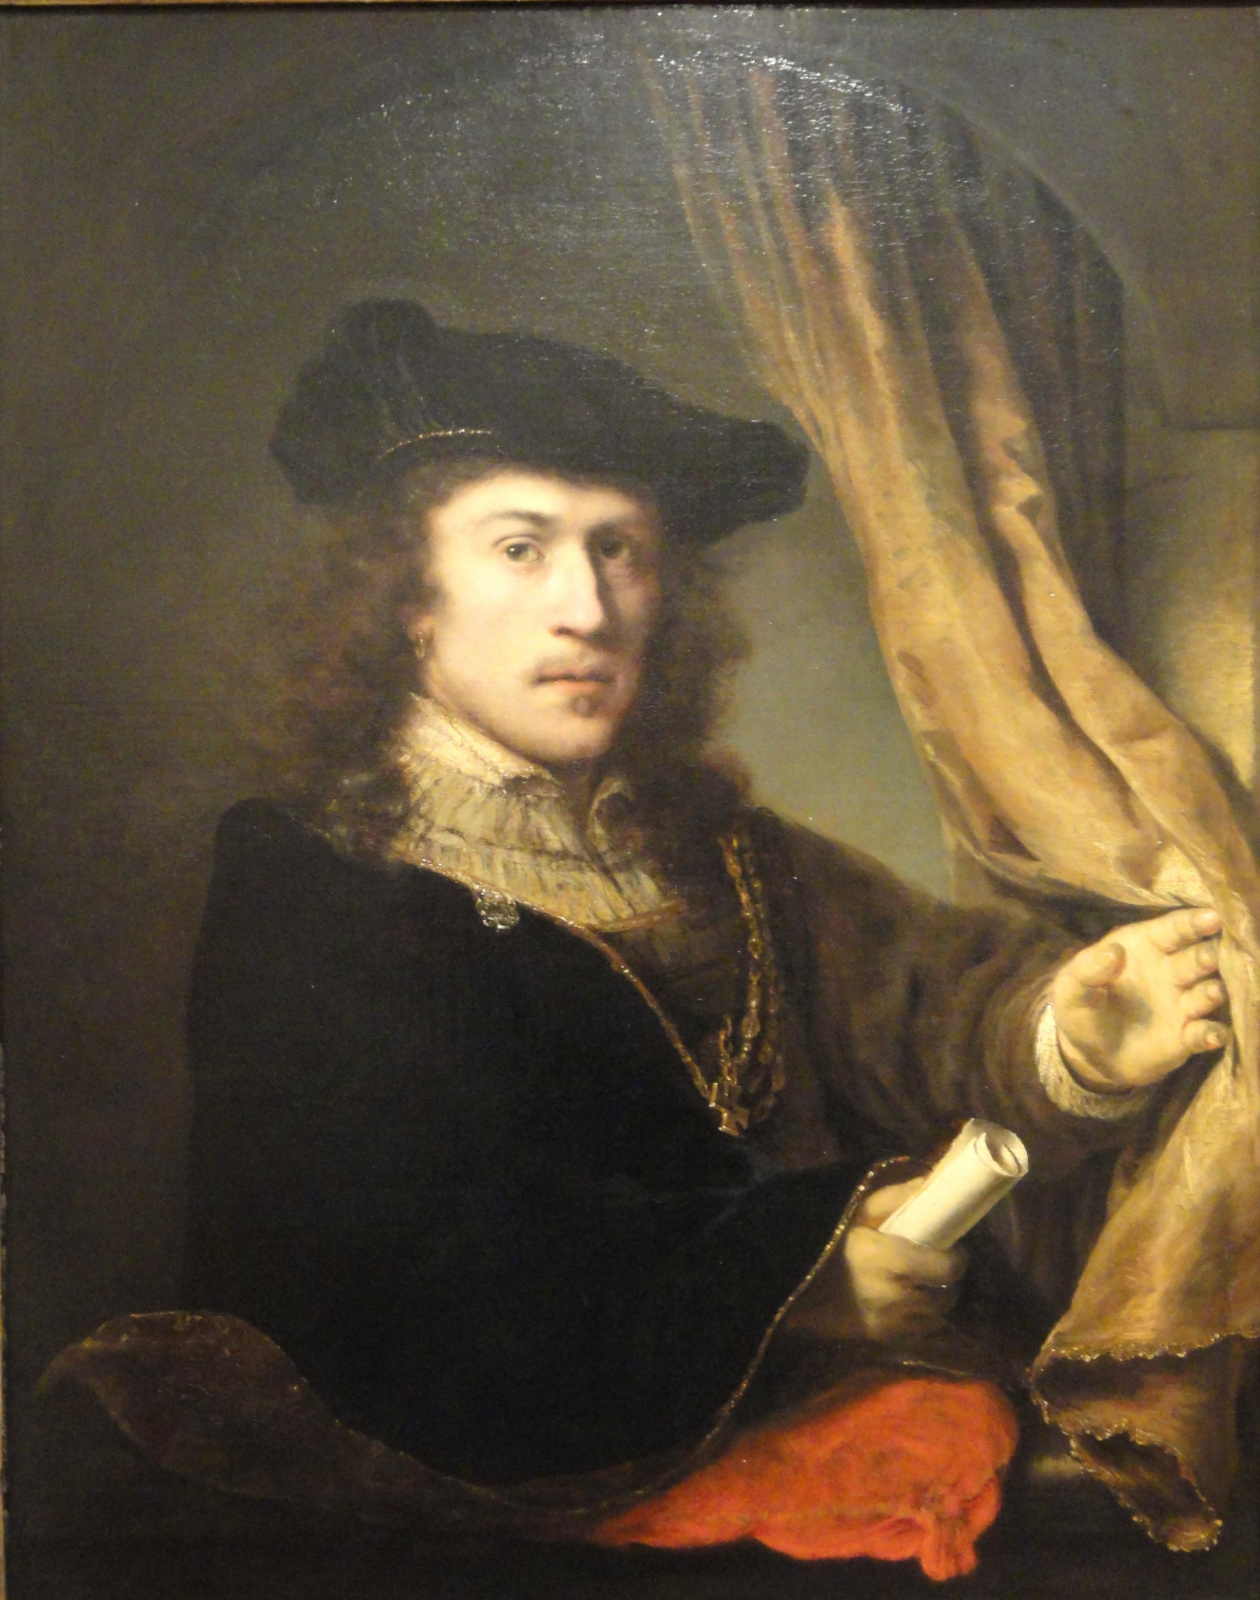 Фердинанд Балтасарс Боль. Автопортрет со свитком